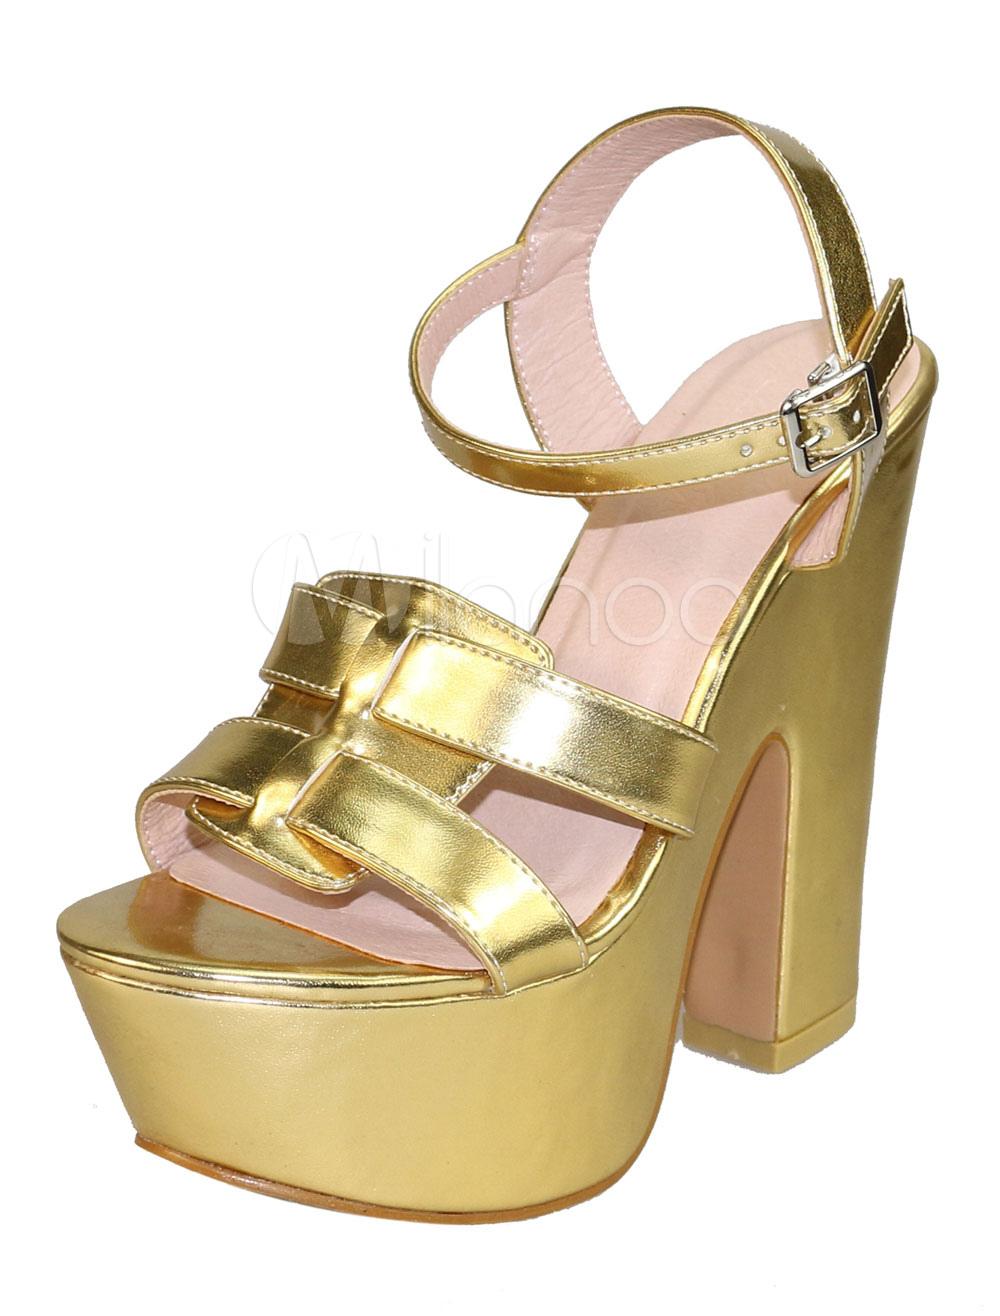 Gold Sexy Sandals Sky High Platform Open Toe Buckle Detail Sandal Shoes For Women